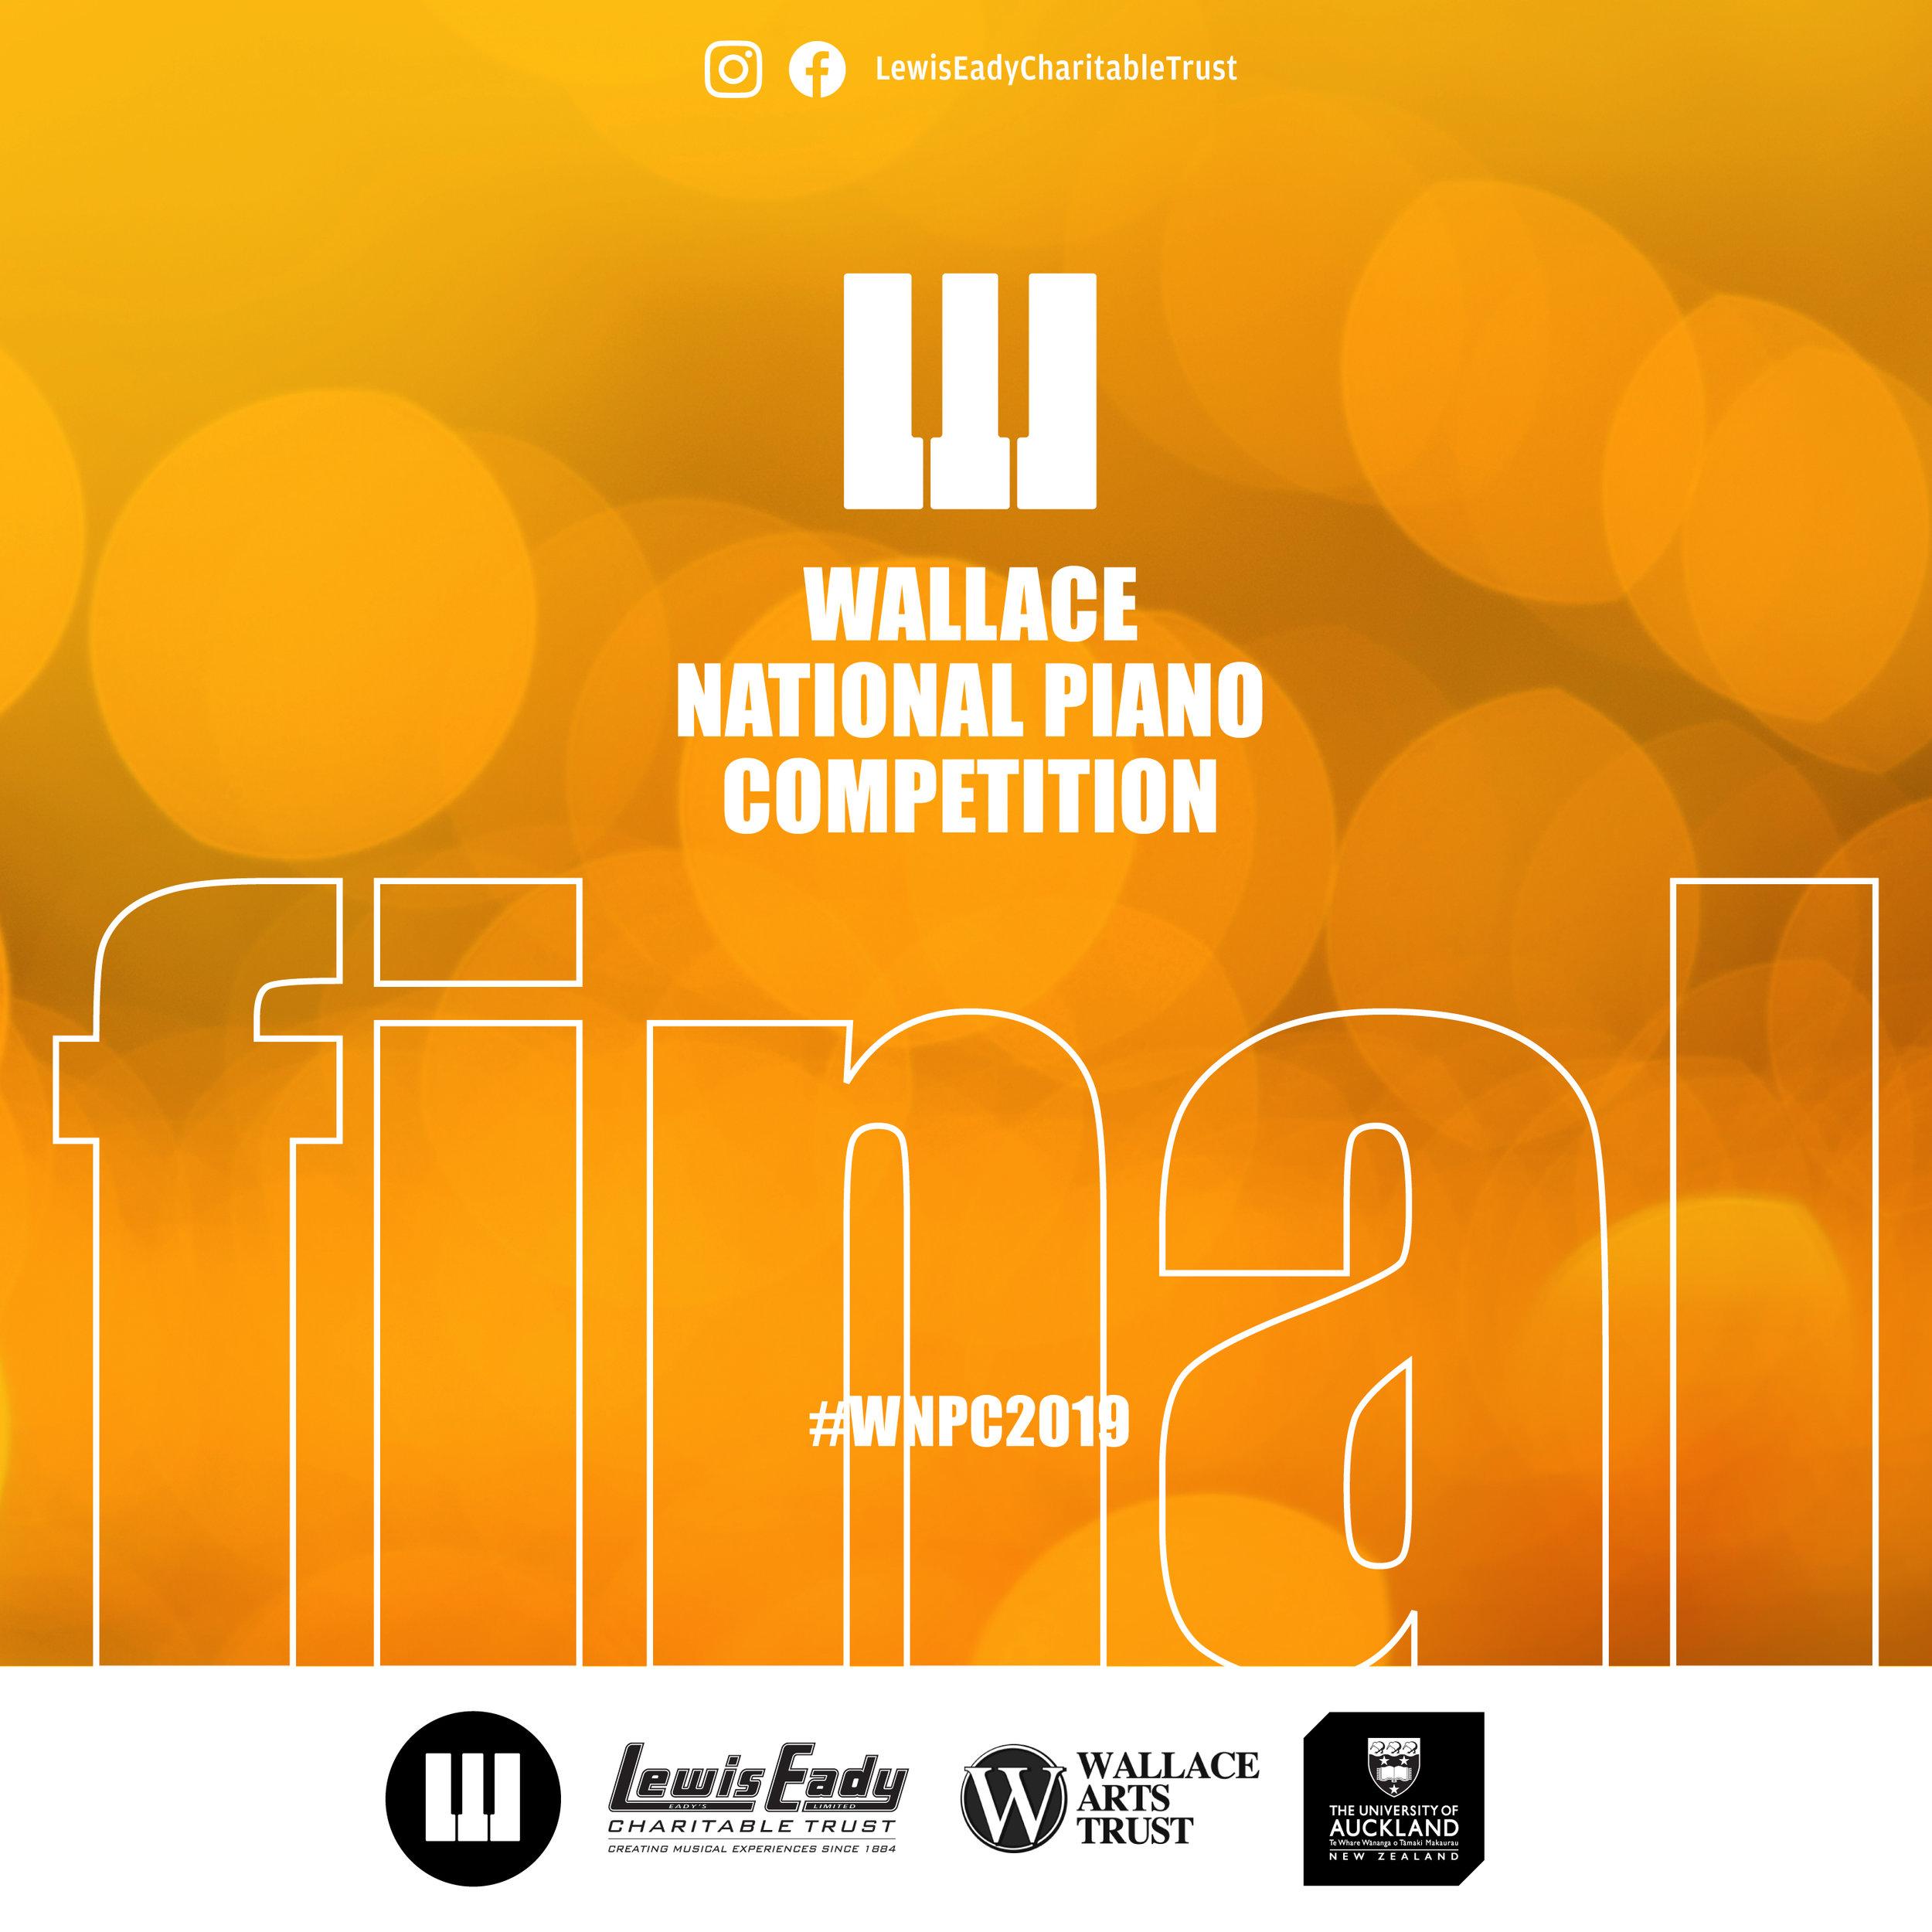 WNPC_2019_Insta_Final.jpg